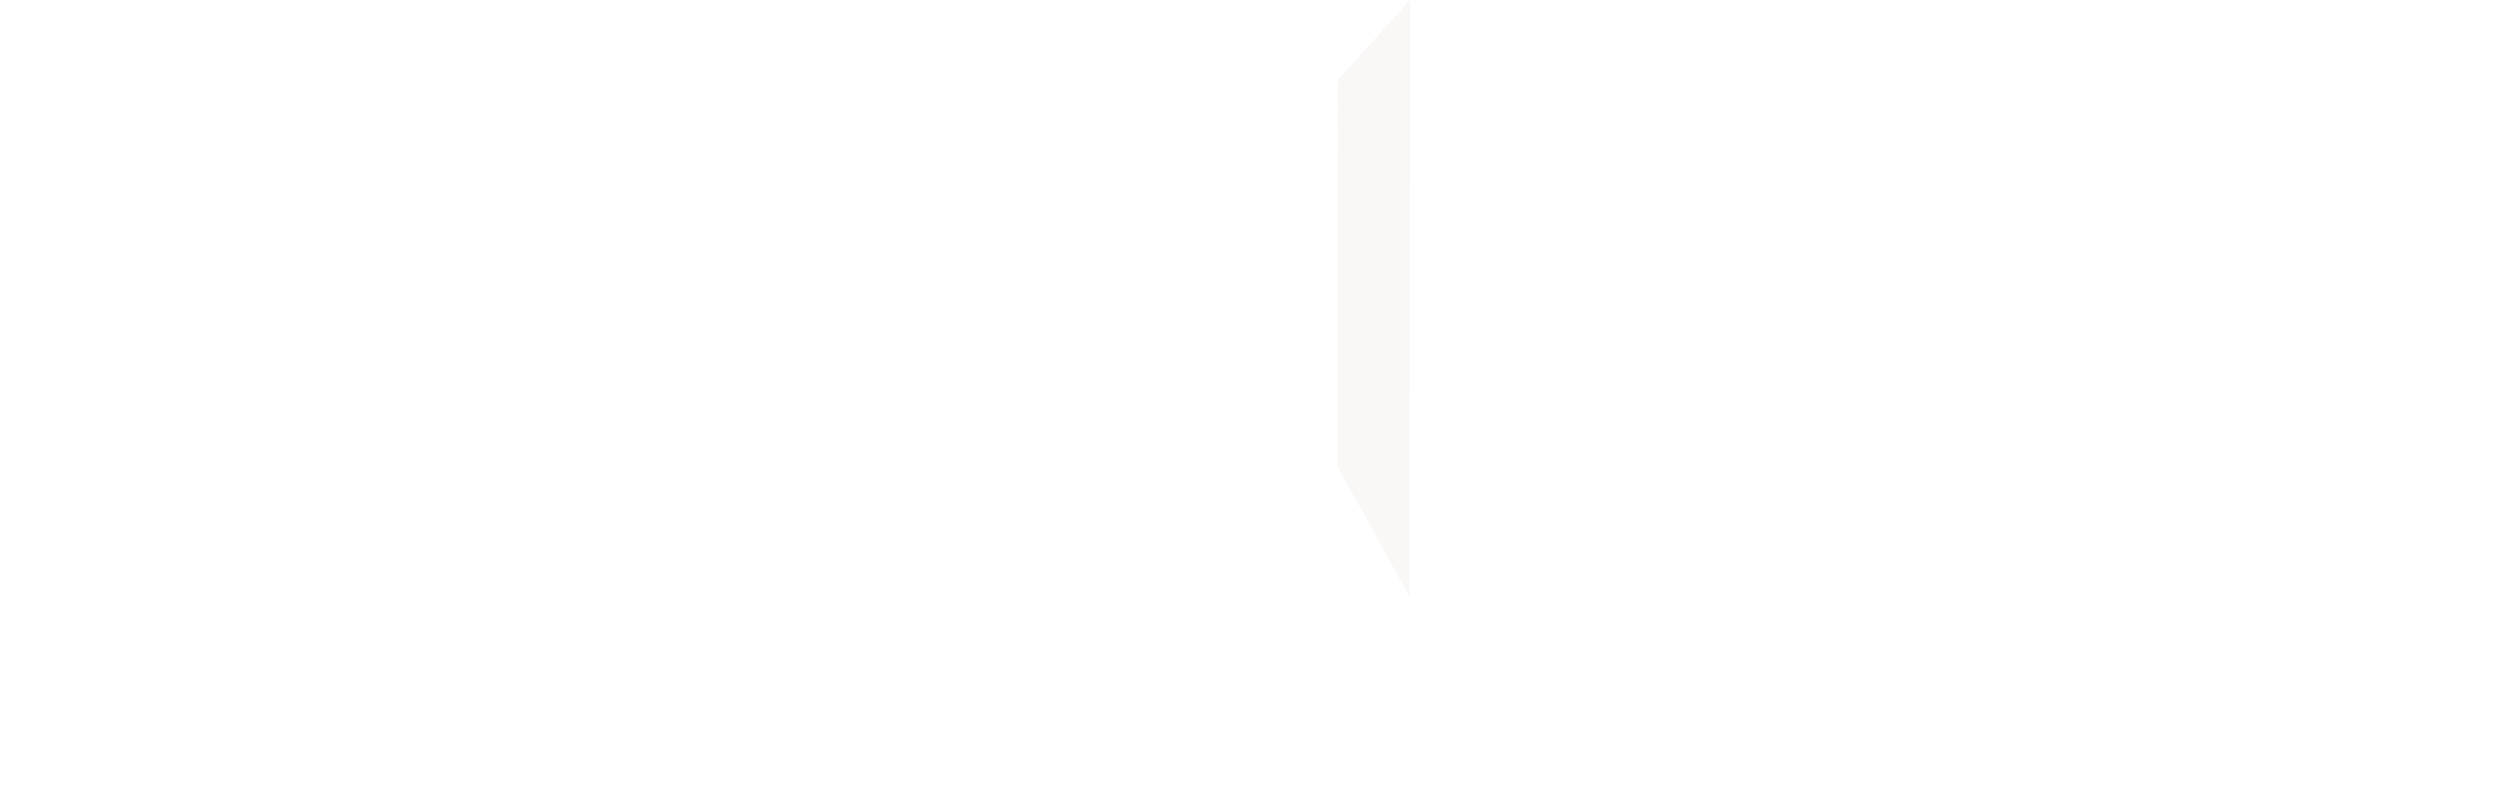 Joosbox Productions